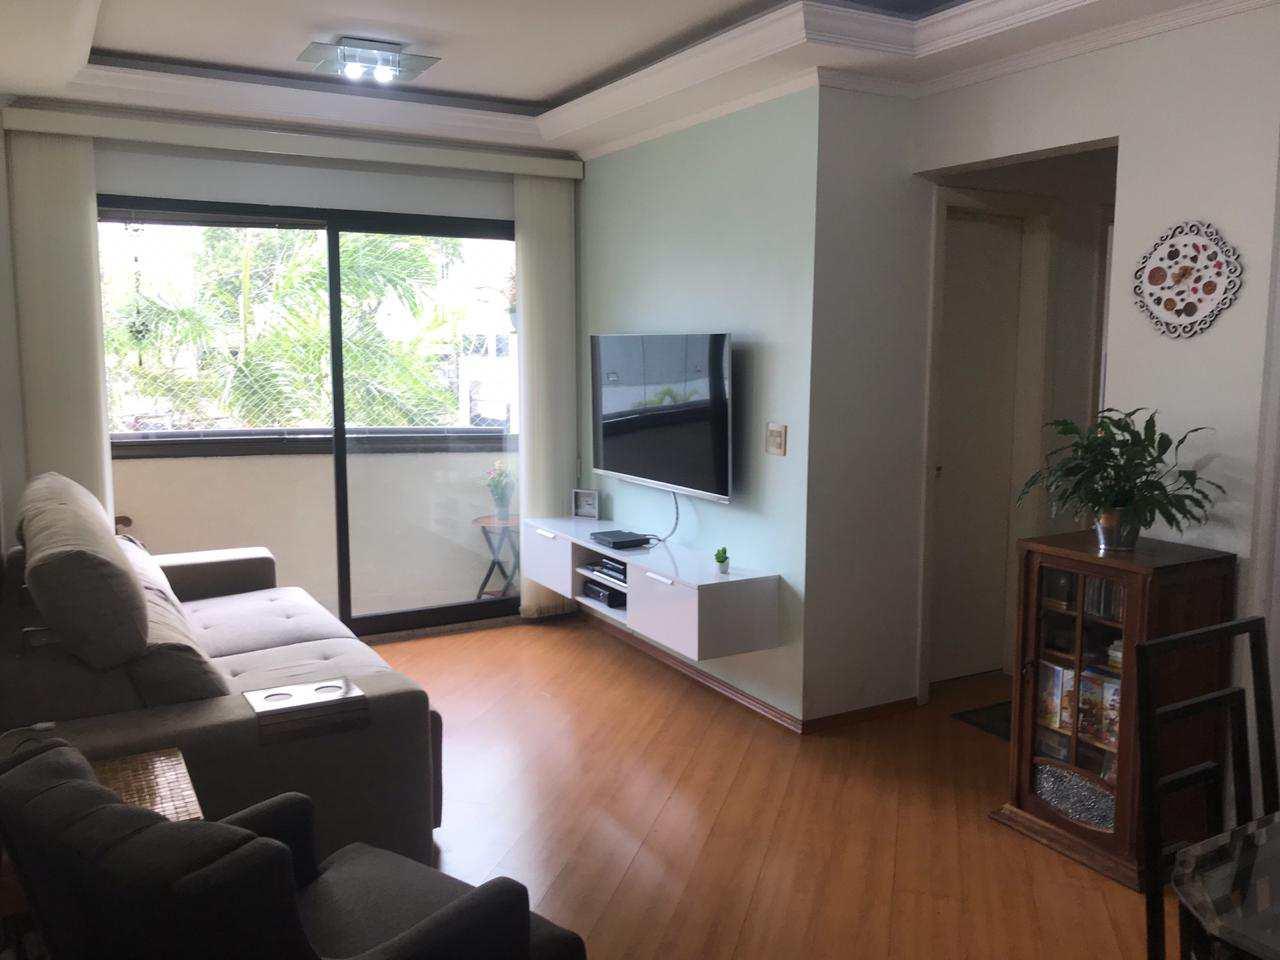 Apartamento com 3 dorms, Vila Monumento, São Paulo - R$ 799 mil, Cod: 3469